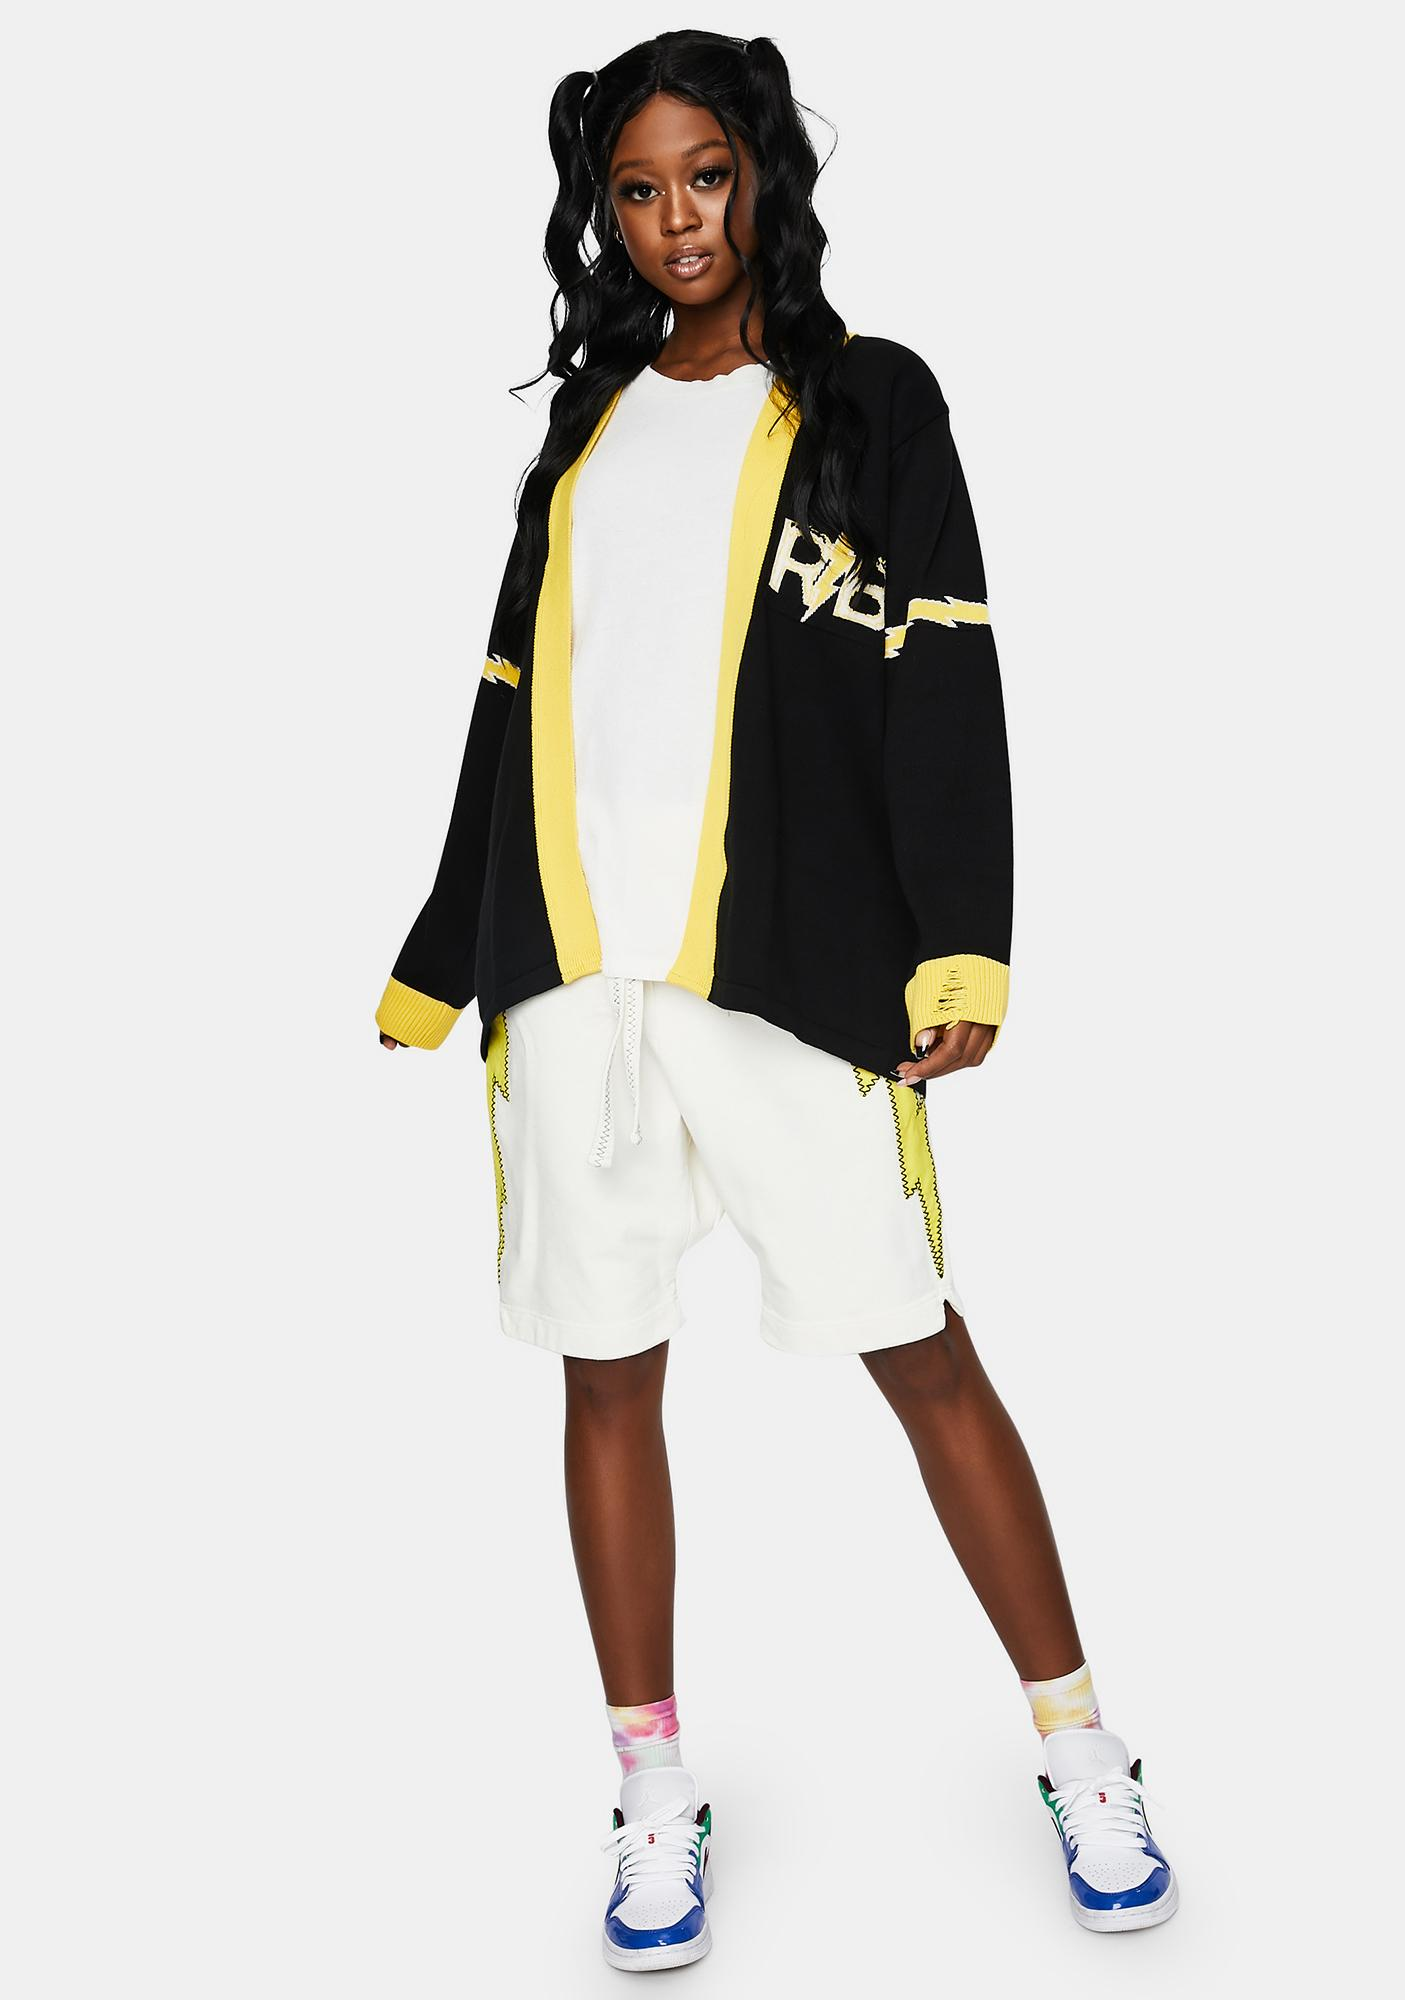 The Rad Black Kids RB Varsity Cardigan